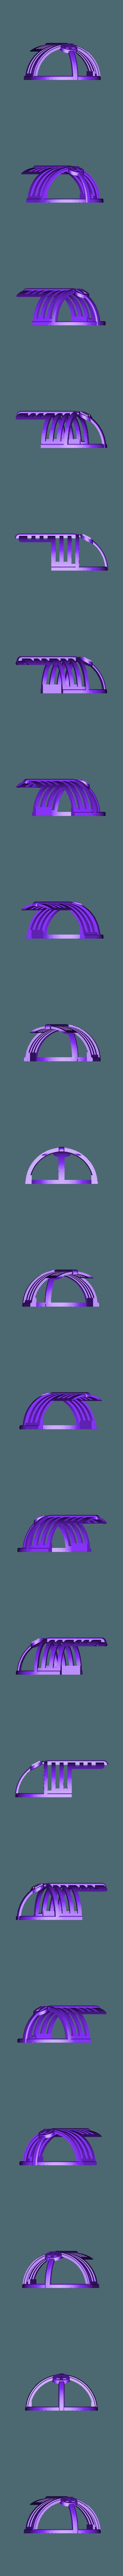 74TRK-GRILLcomplete.stl Download STL file Ratrod Pickup • 3D printing template, macone1